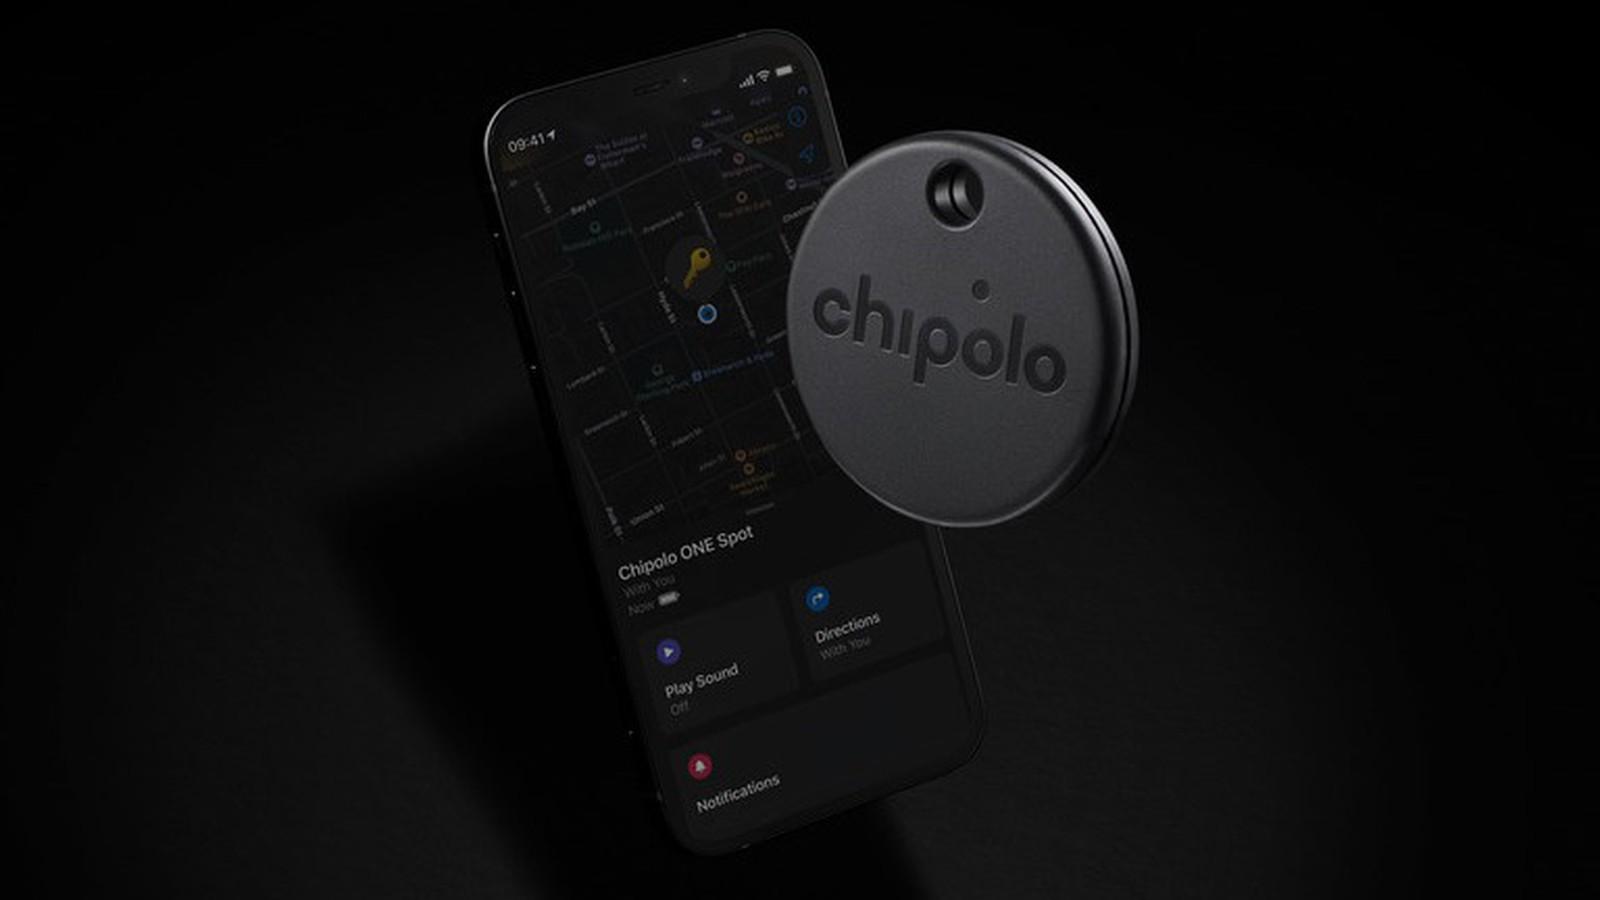 Apple Najít Chipolo